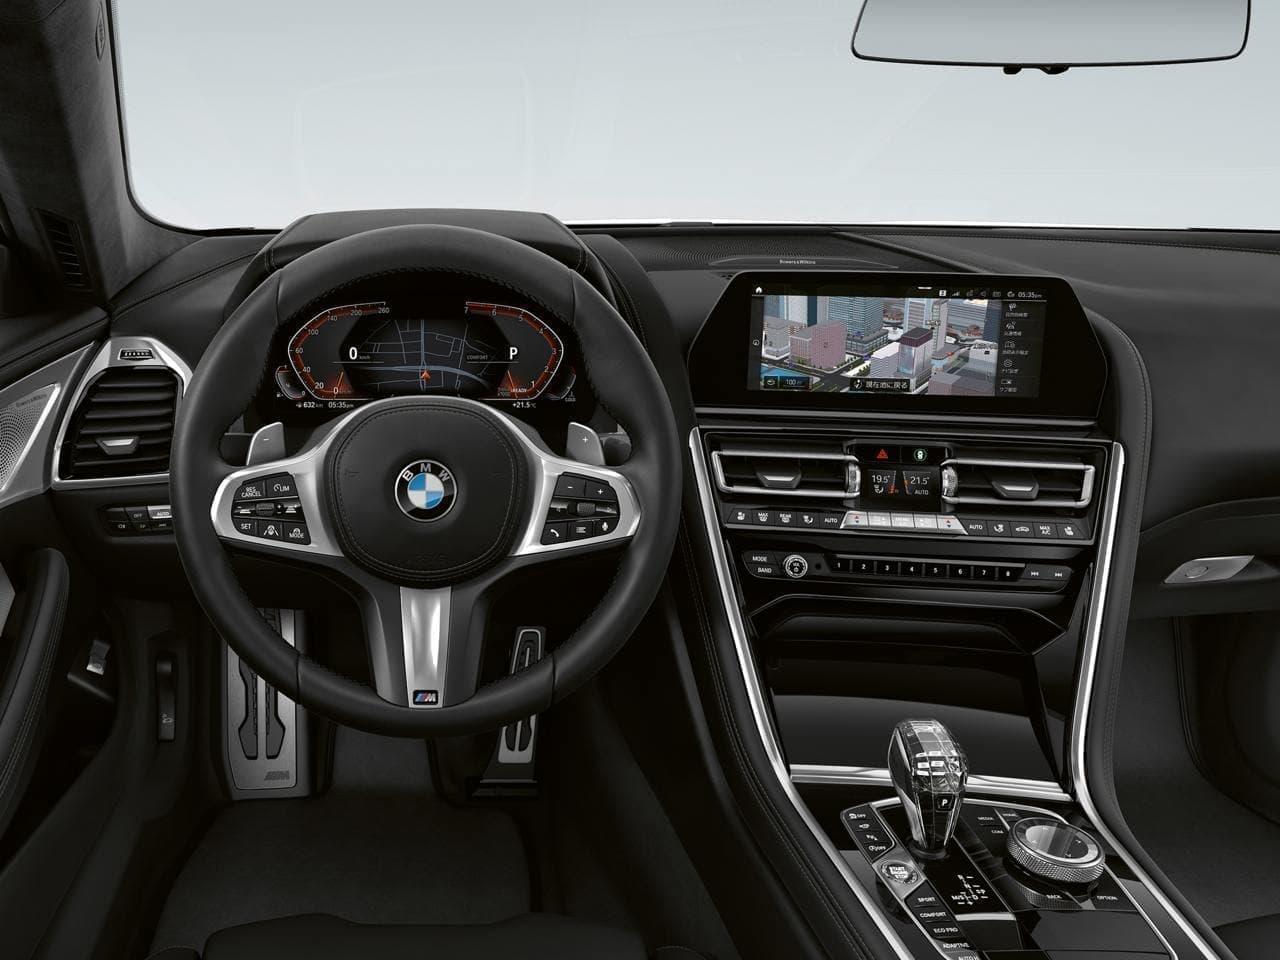 BMW 8シリーズに限定車「Frozen Black Edition」 内外装を漆黒で統一